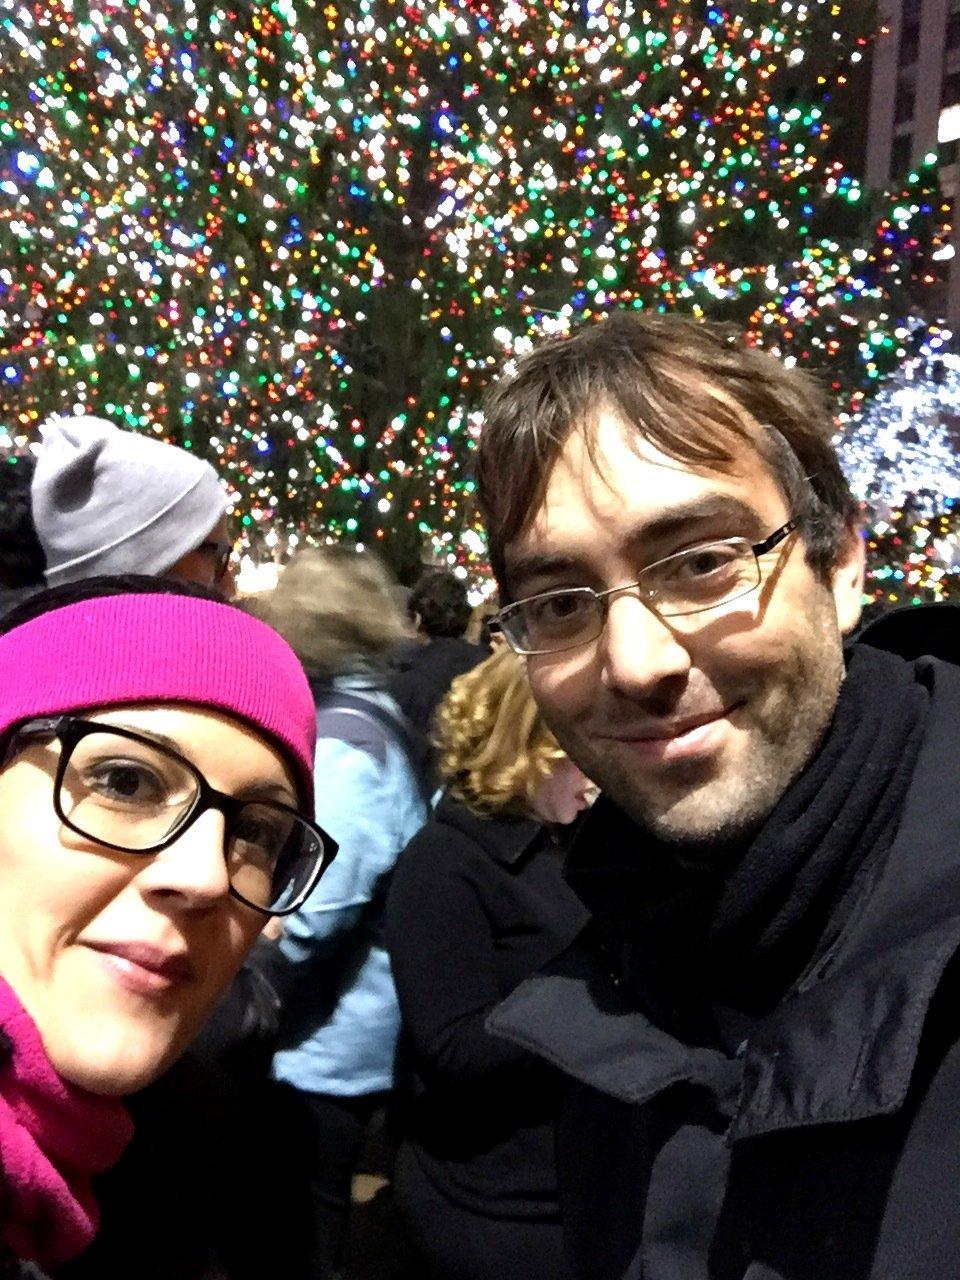 albero di natale del rockefeller center, selfie al rockefeller center, new york rockefeller center christmans tree